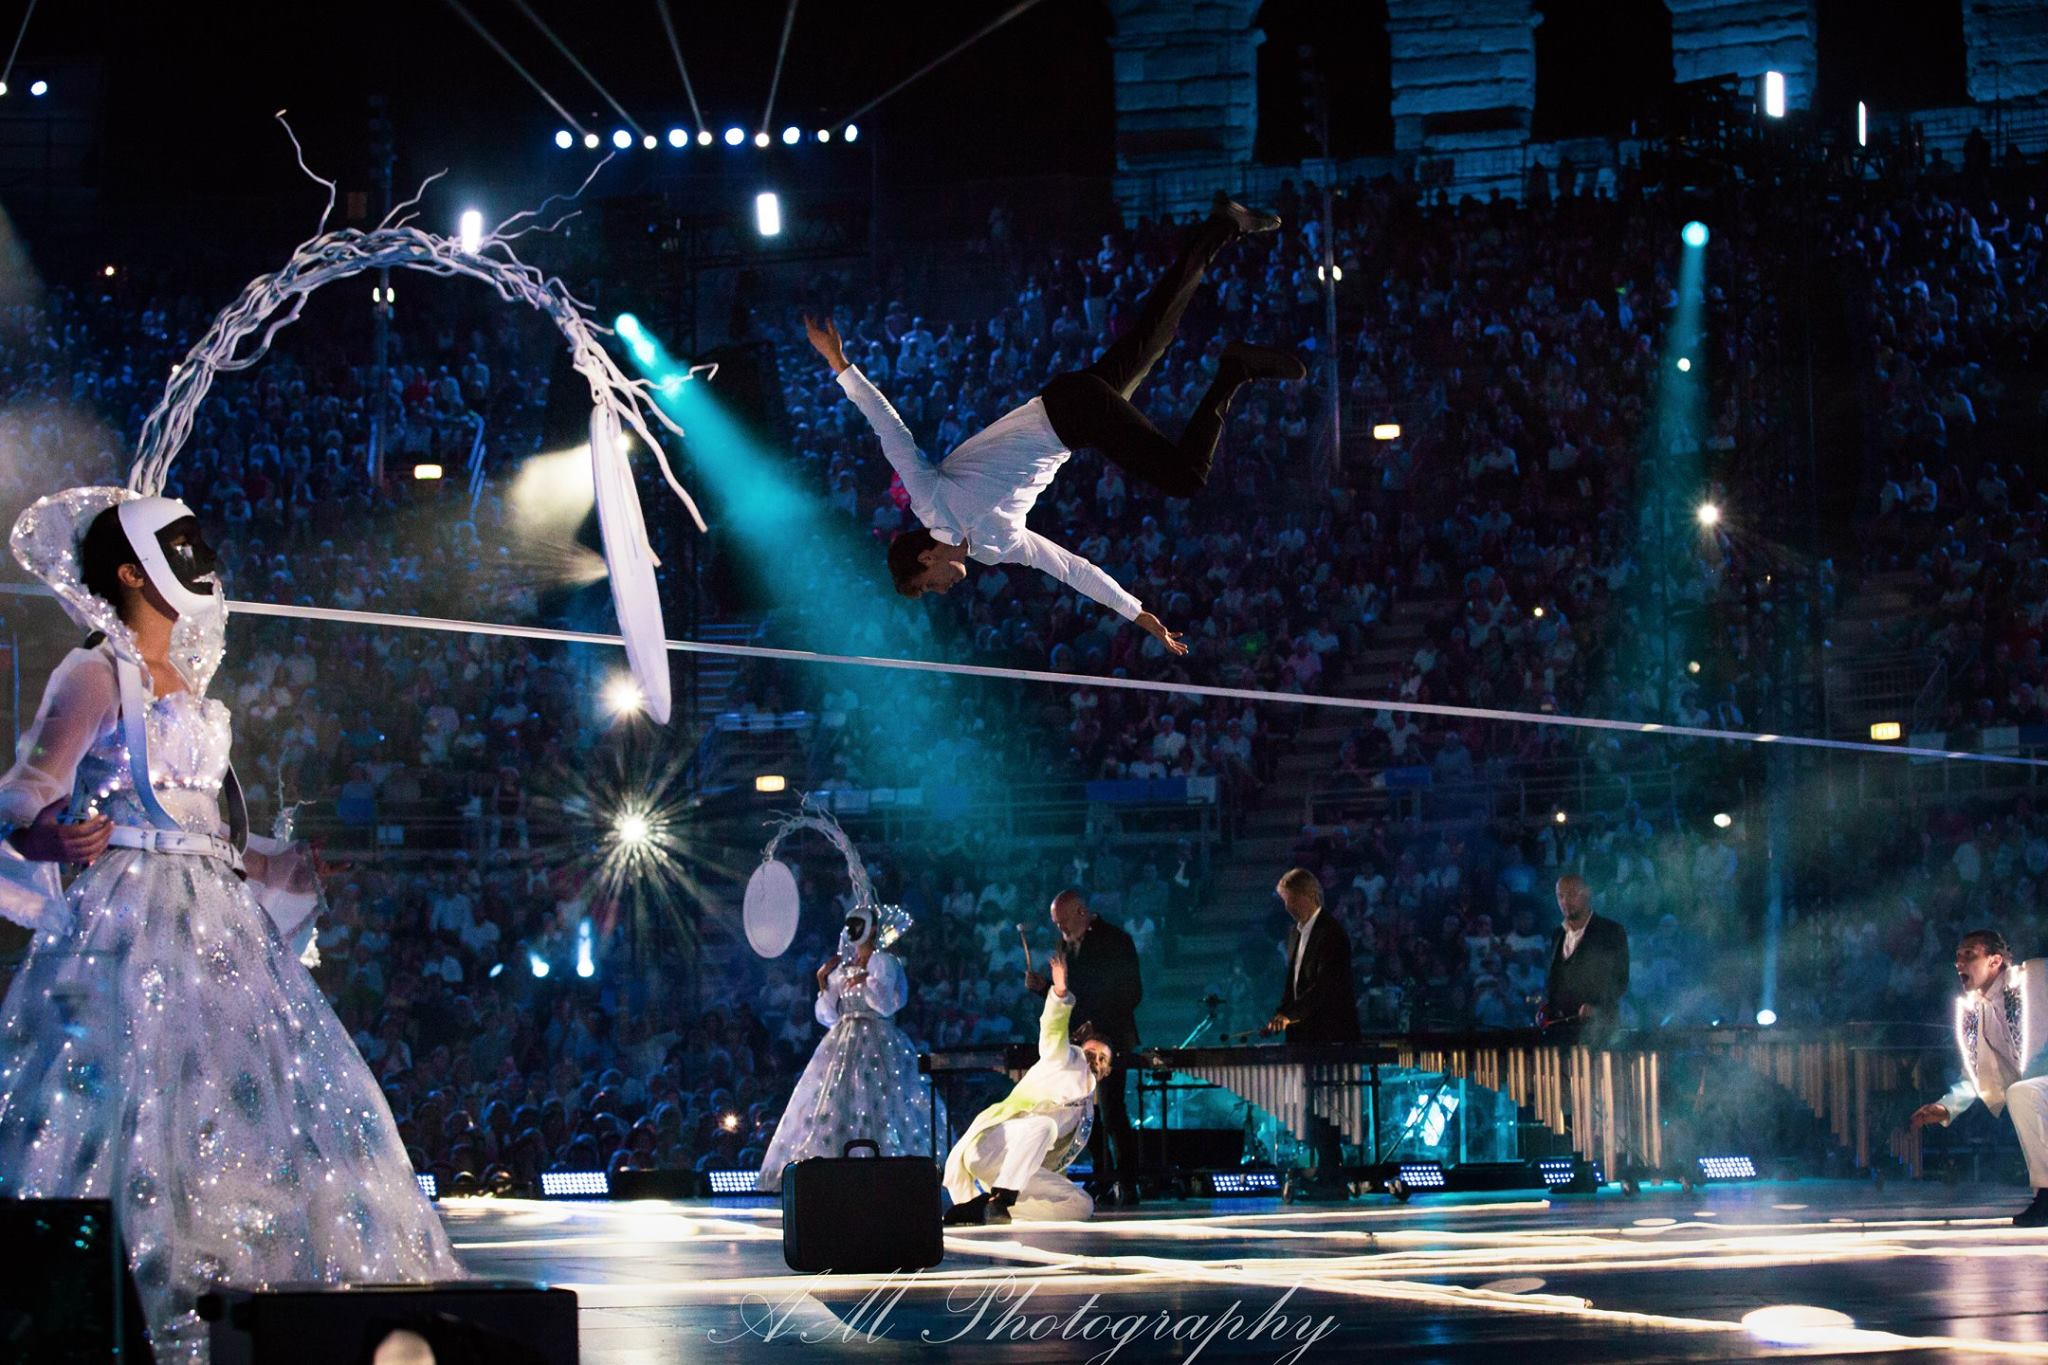 claudio baglioni arena di verona italia italy 50 al centro highline trickline show funambule circus performance spectacle suisse Slackline Lyell Grunberg  (10).jpg